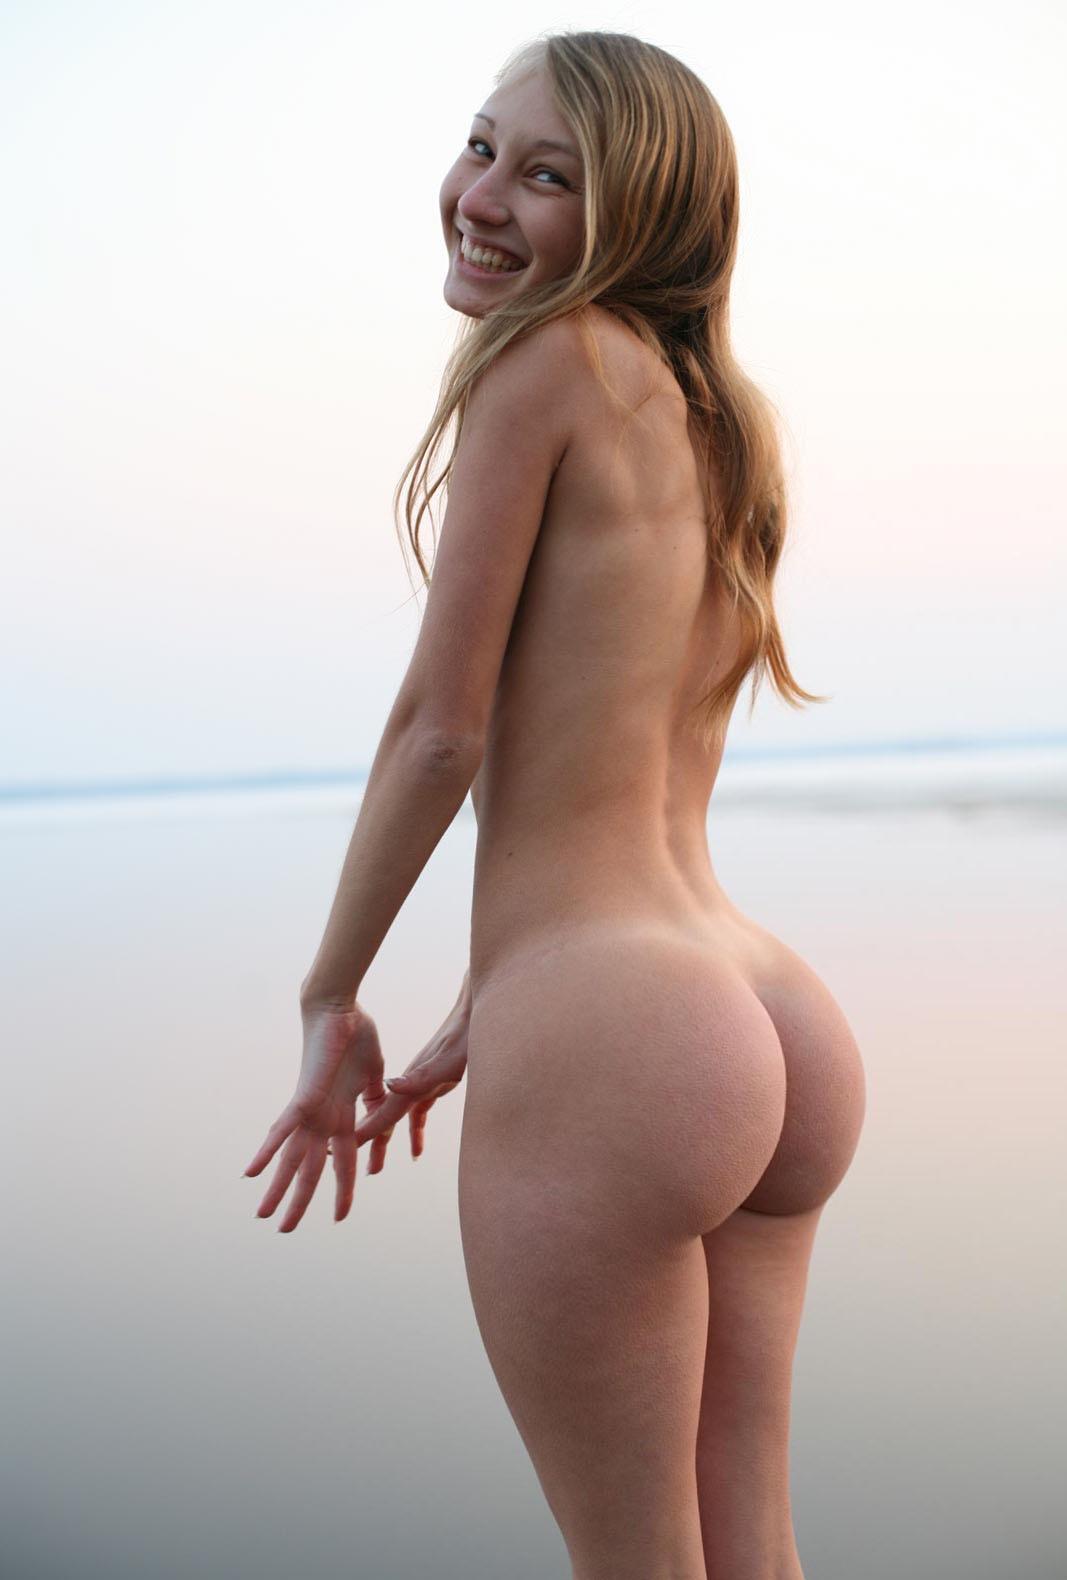 Apologise, nice butt women opinion you